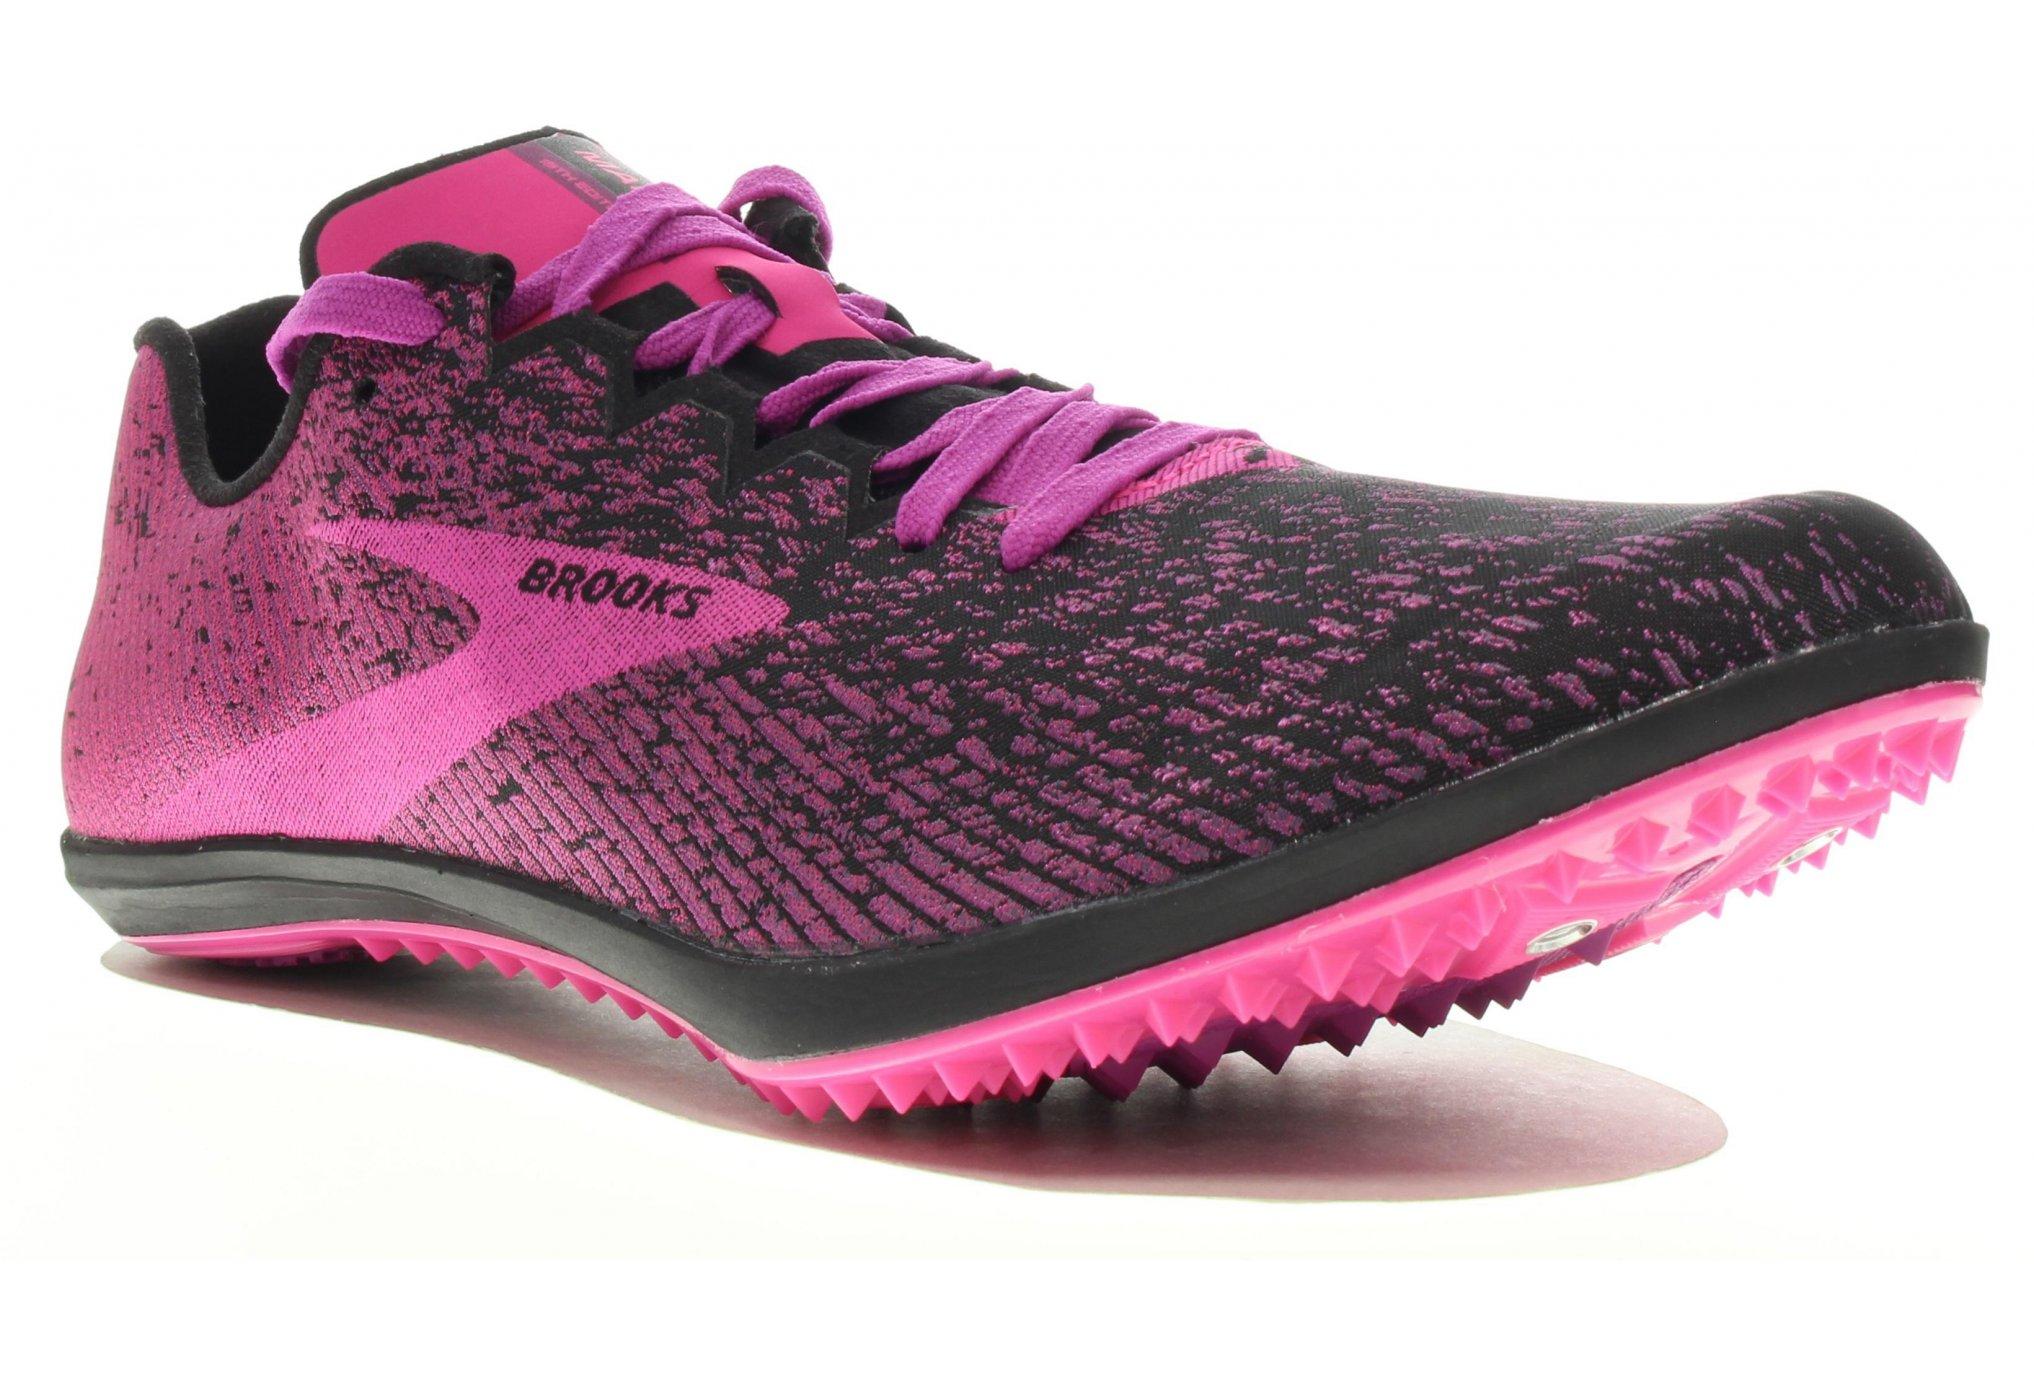 Brooks Mach 19 W Diététique Chaussures femme